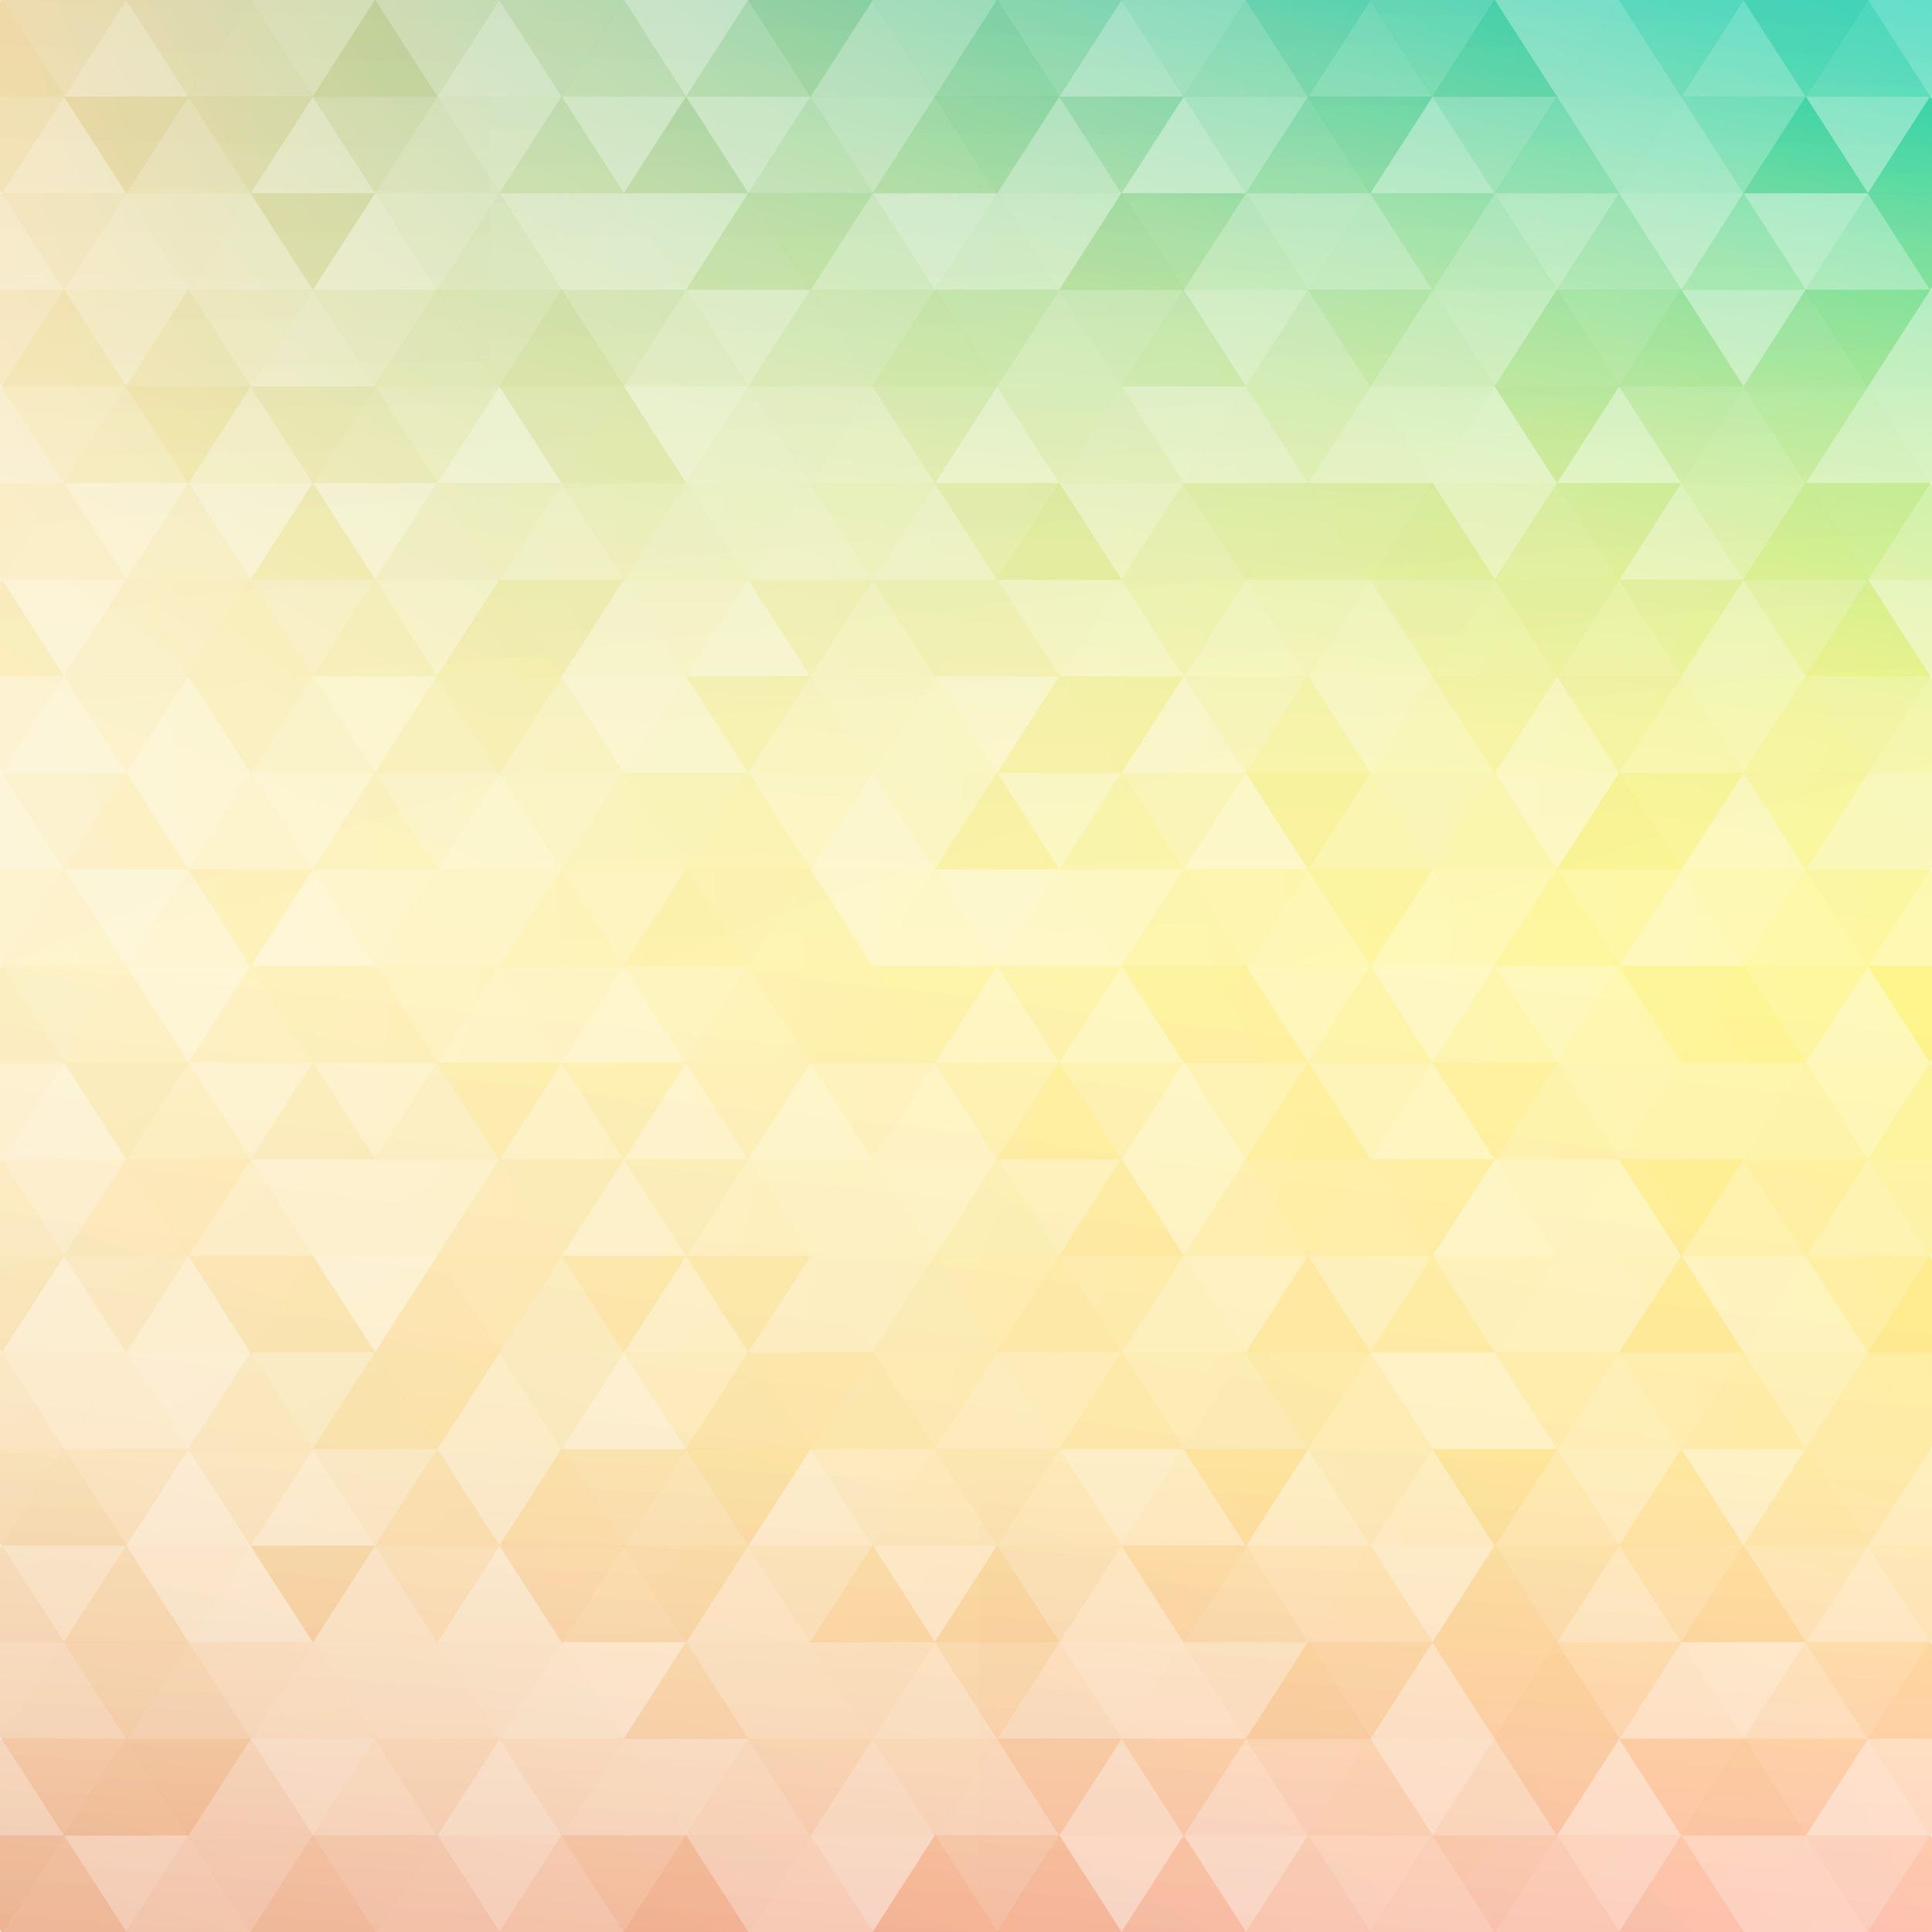 ART_Pattern_Geometric.jpg